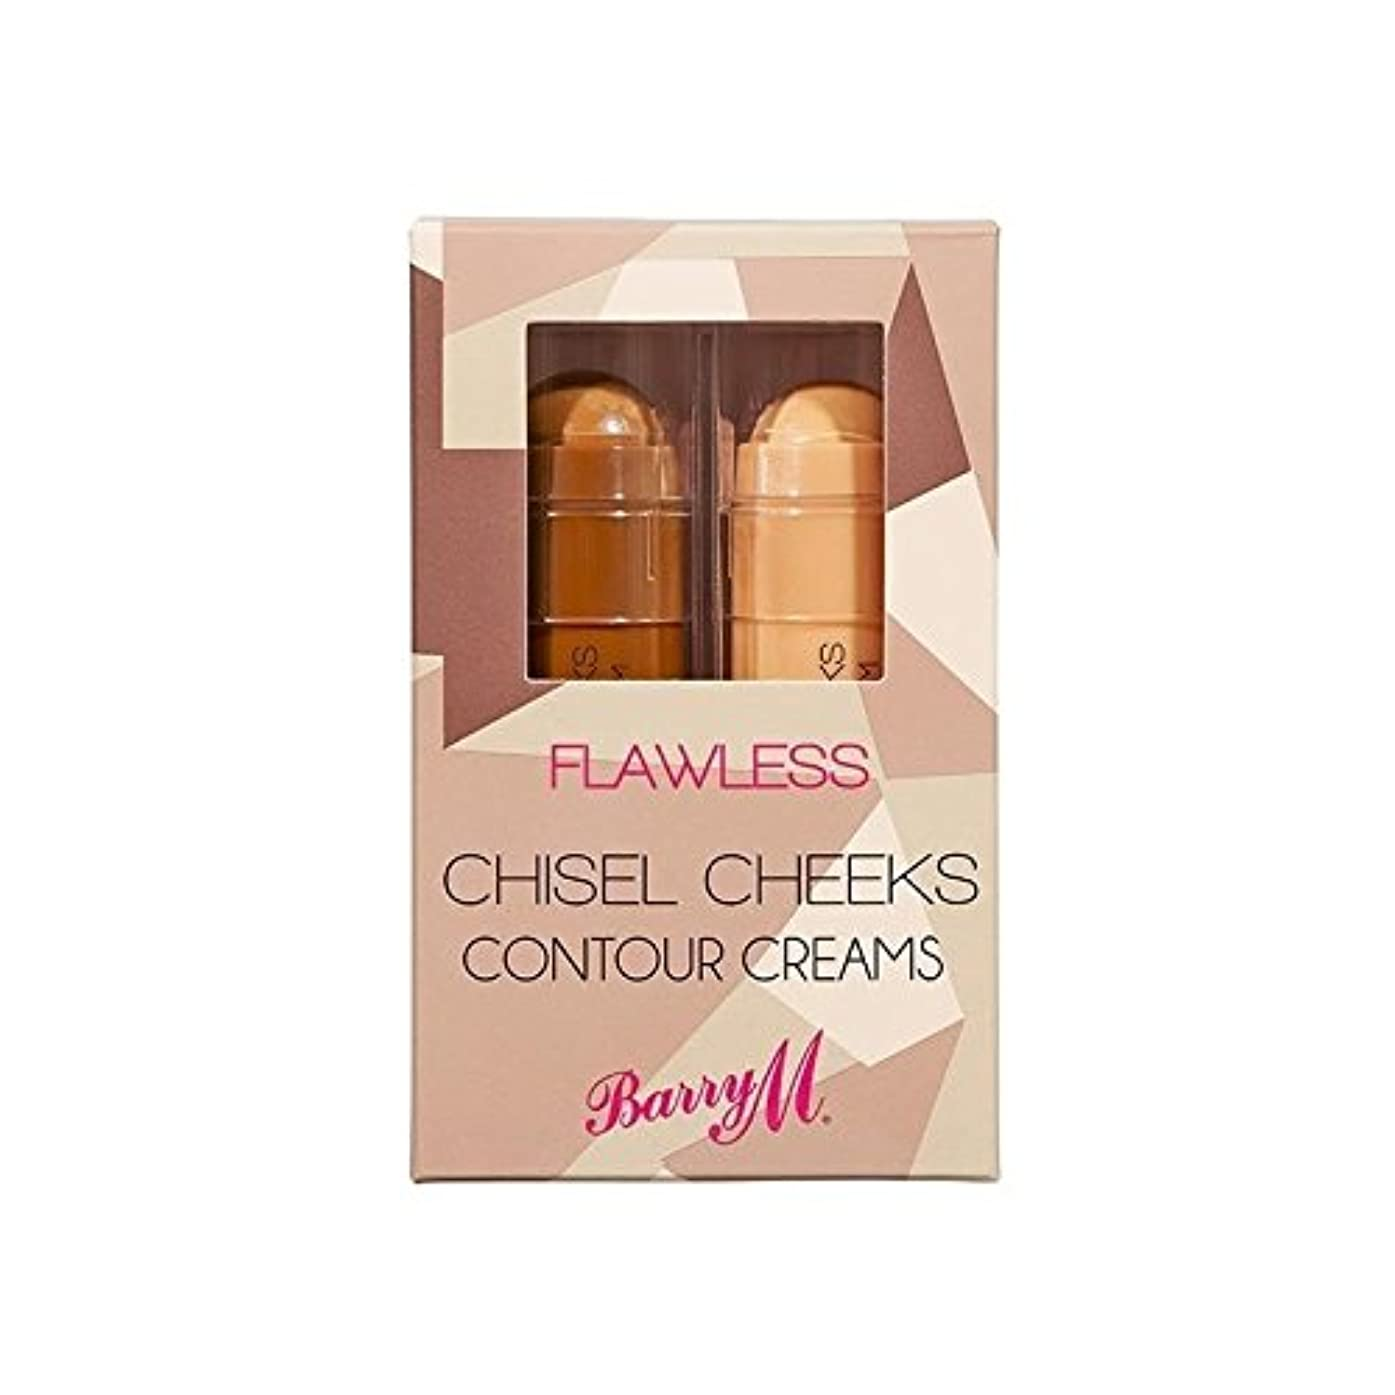 Barry M Chisel Cheek Contour Creams - バリーメートルチゼル頬の輪郭クリーム [並行輸入品]